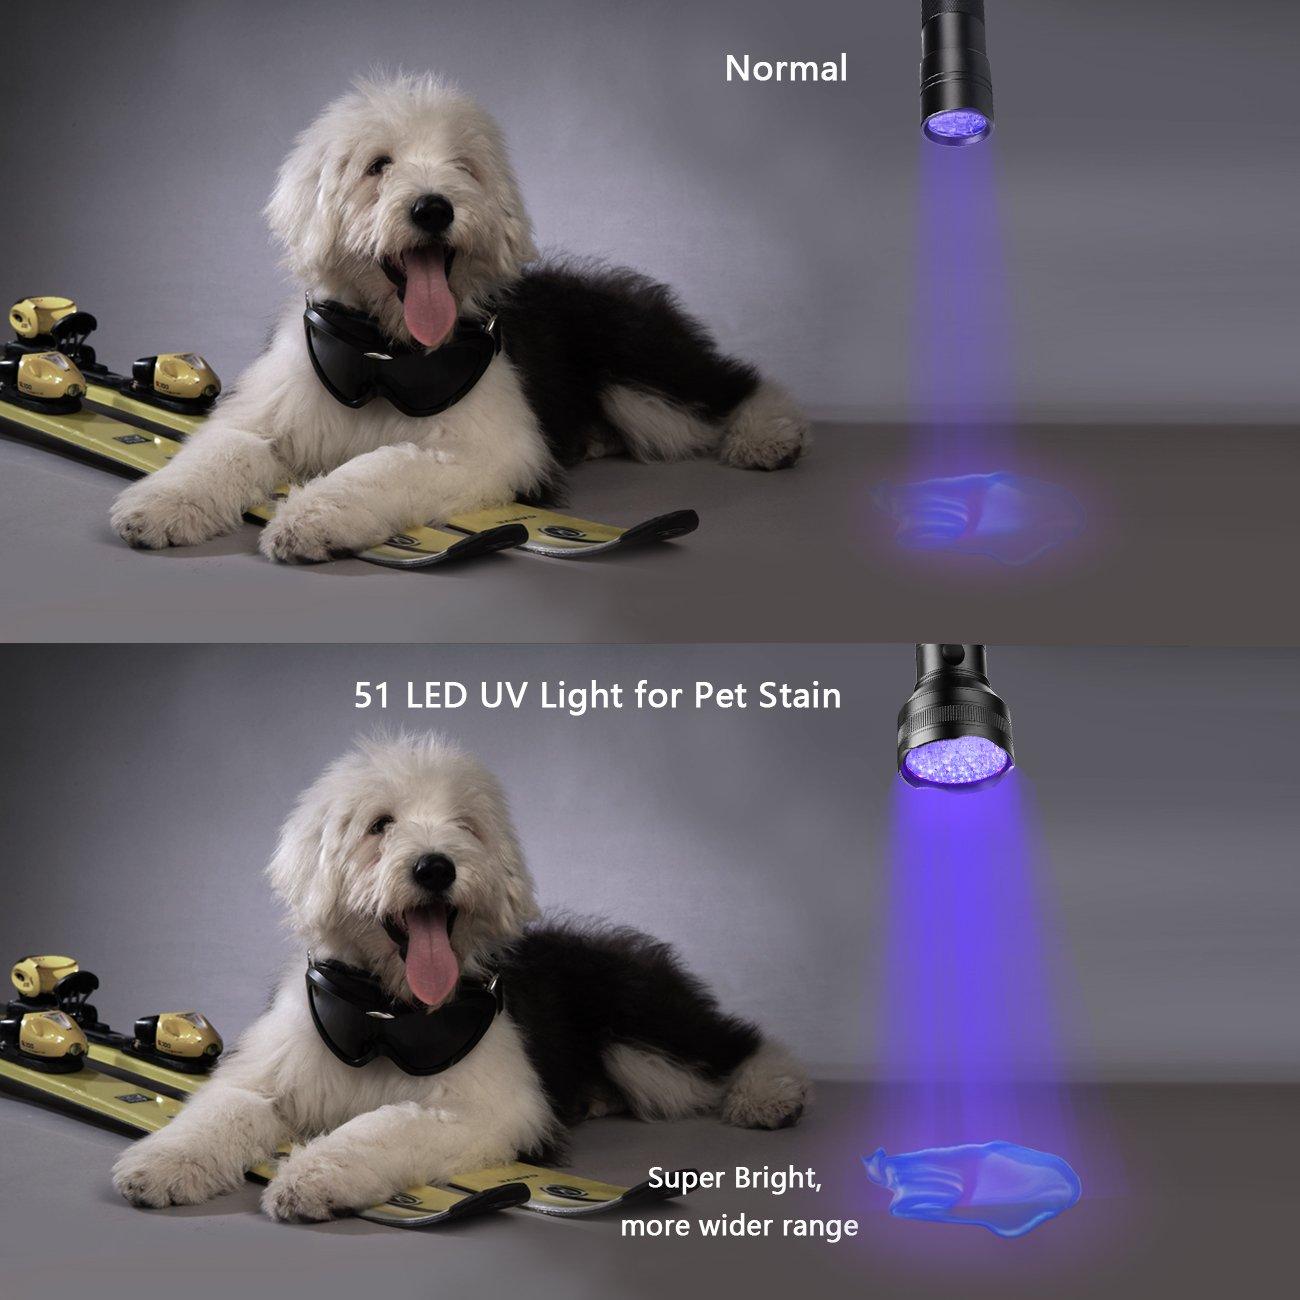 Blacklight Flashlights, 711TEK 51 LED Ultra Violet Flashlight 395-405 nm UV Detector Light for Dog Urine, Pet Stains and Bed Bug, Scorpion Hunting (1)